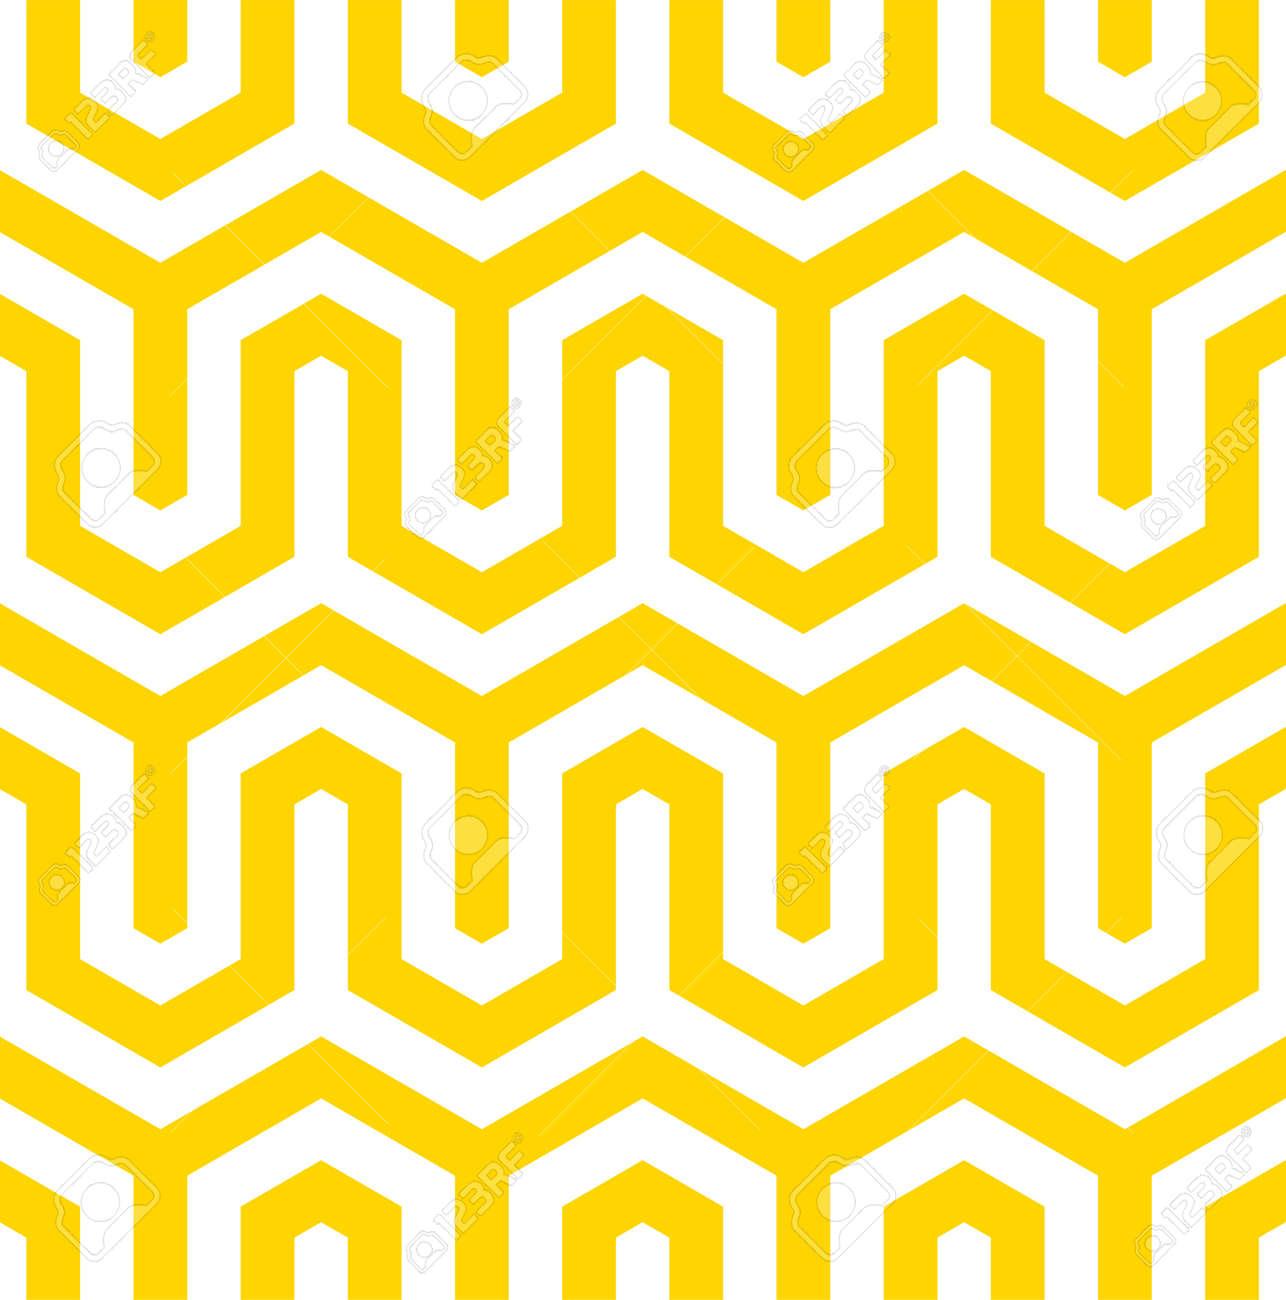 Vector yellow geometric pattern. Seamless modern linear texture. - 145855254